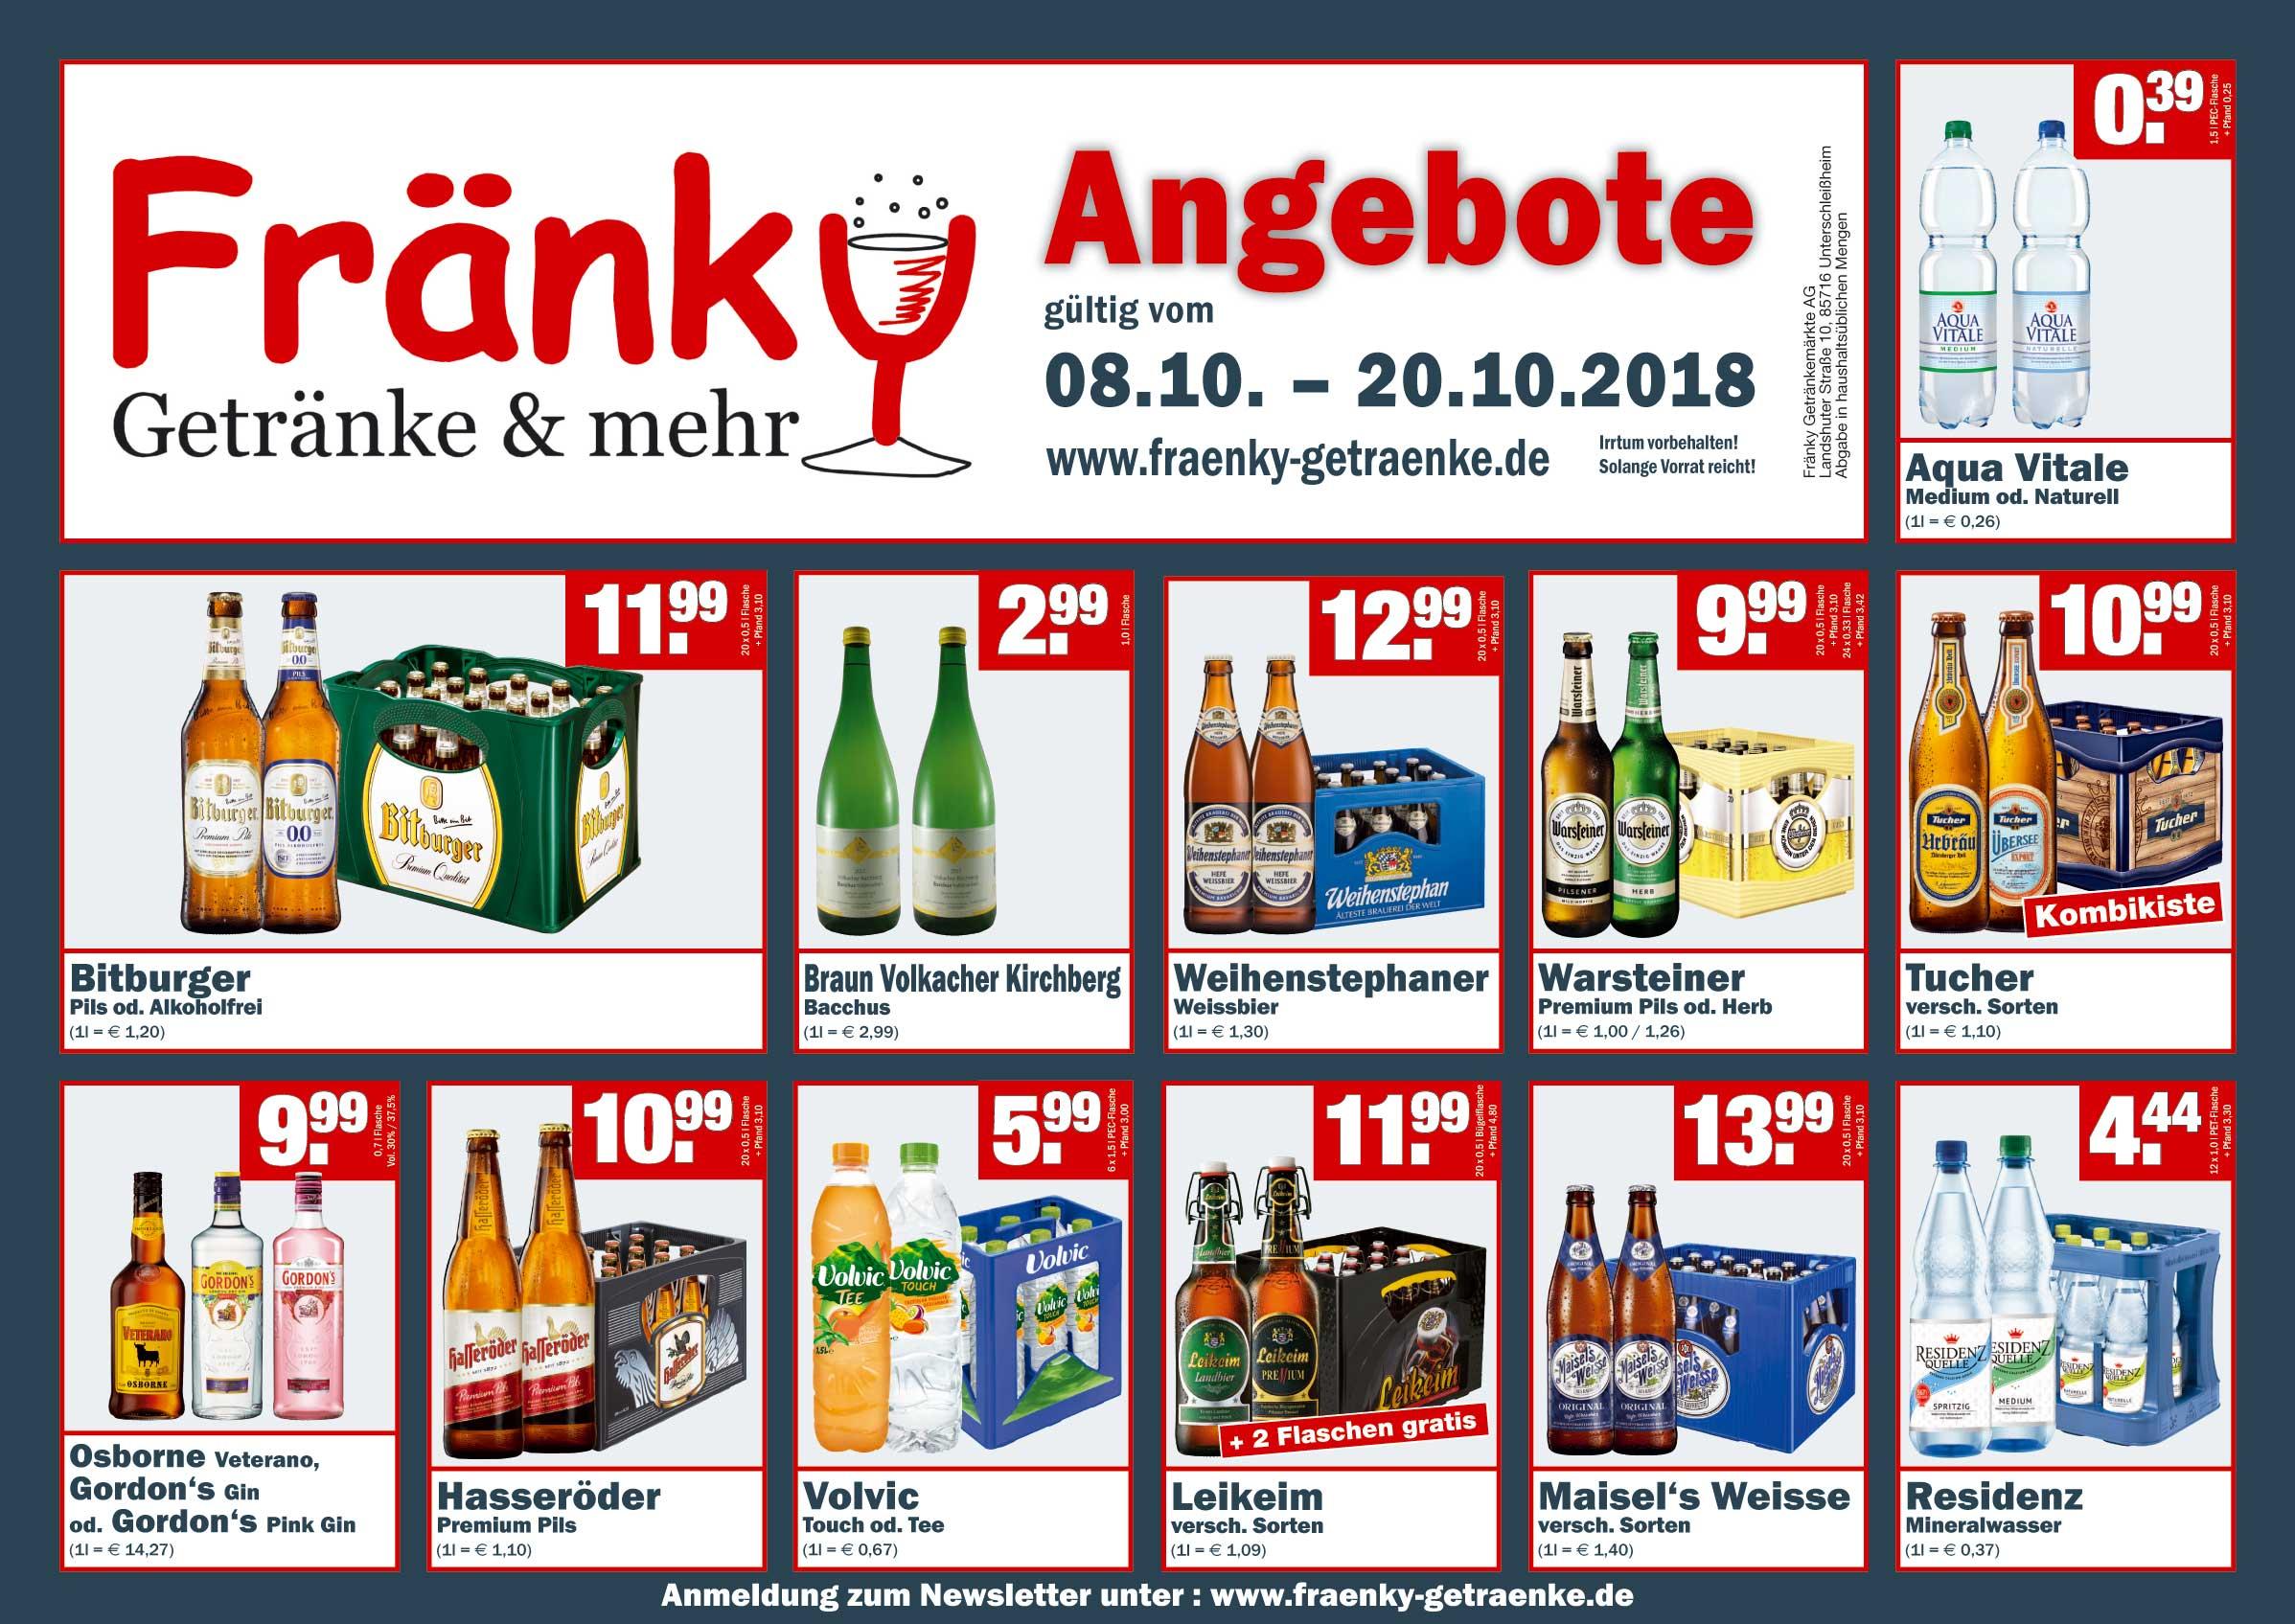 Fränky Getränkemärkte